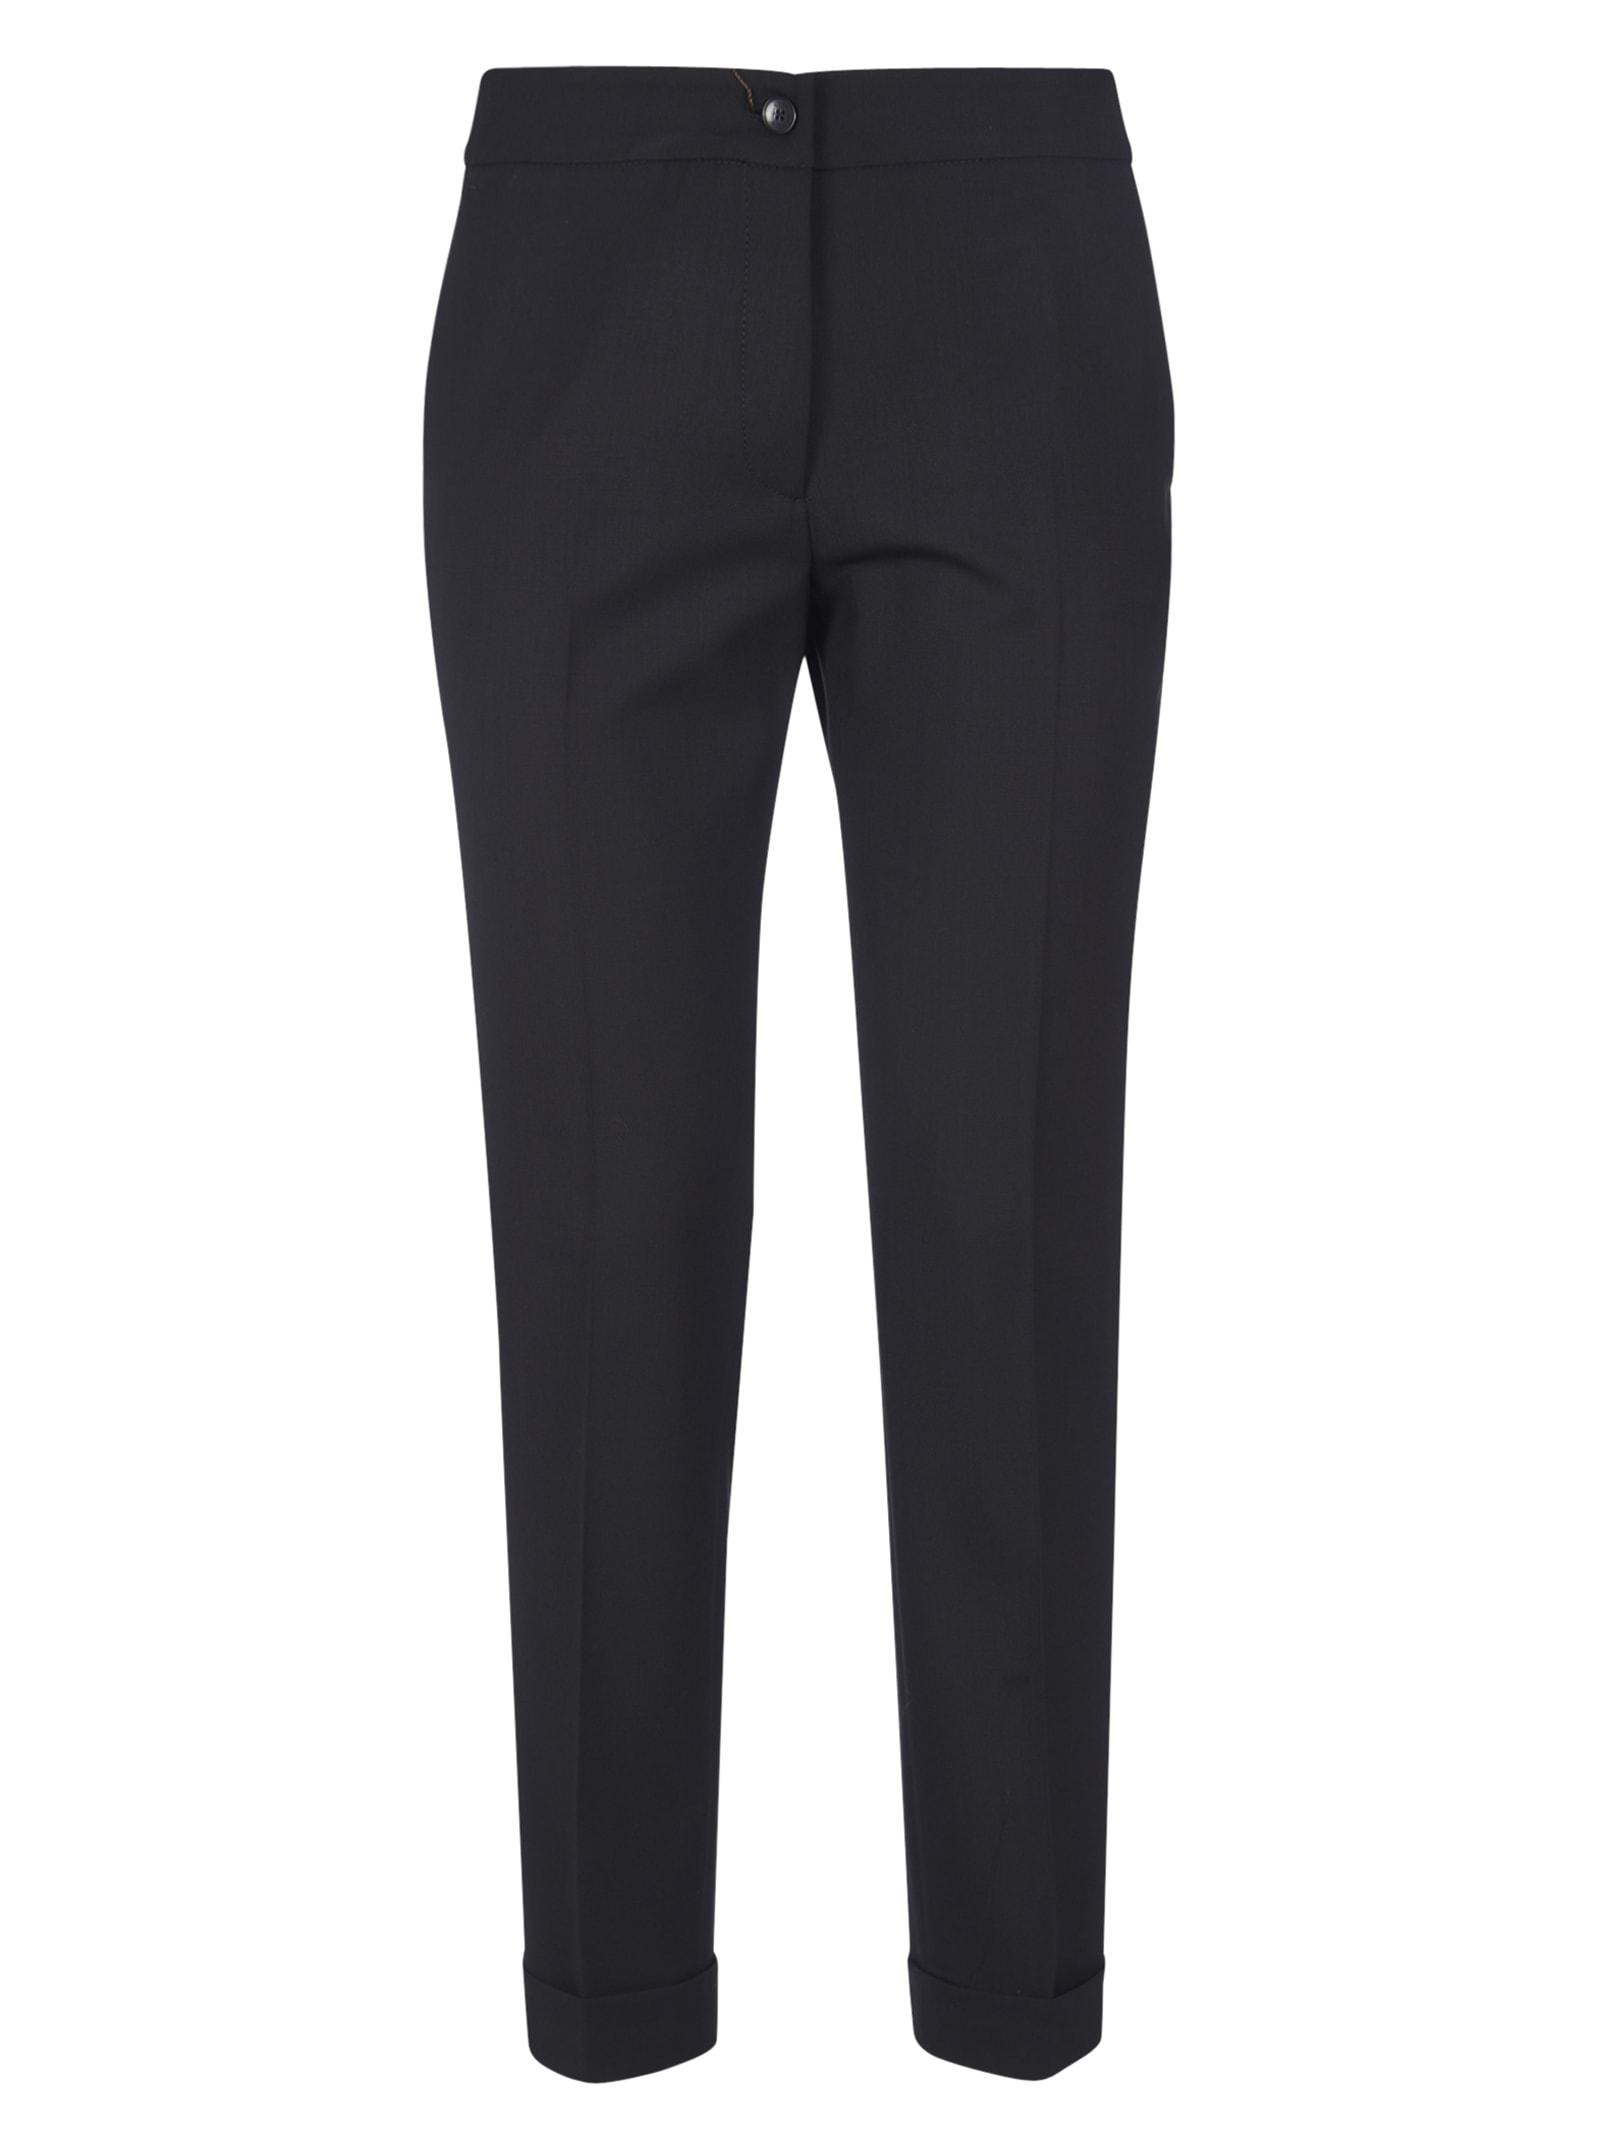 Etro Regular Trousers In Black